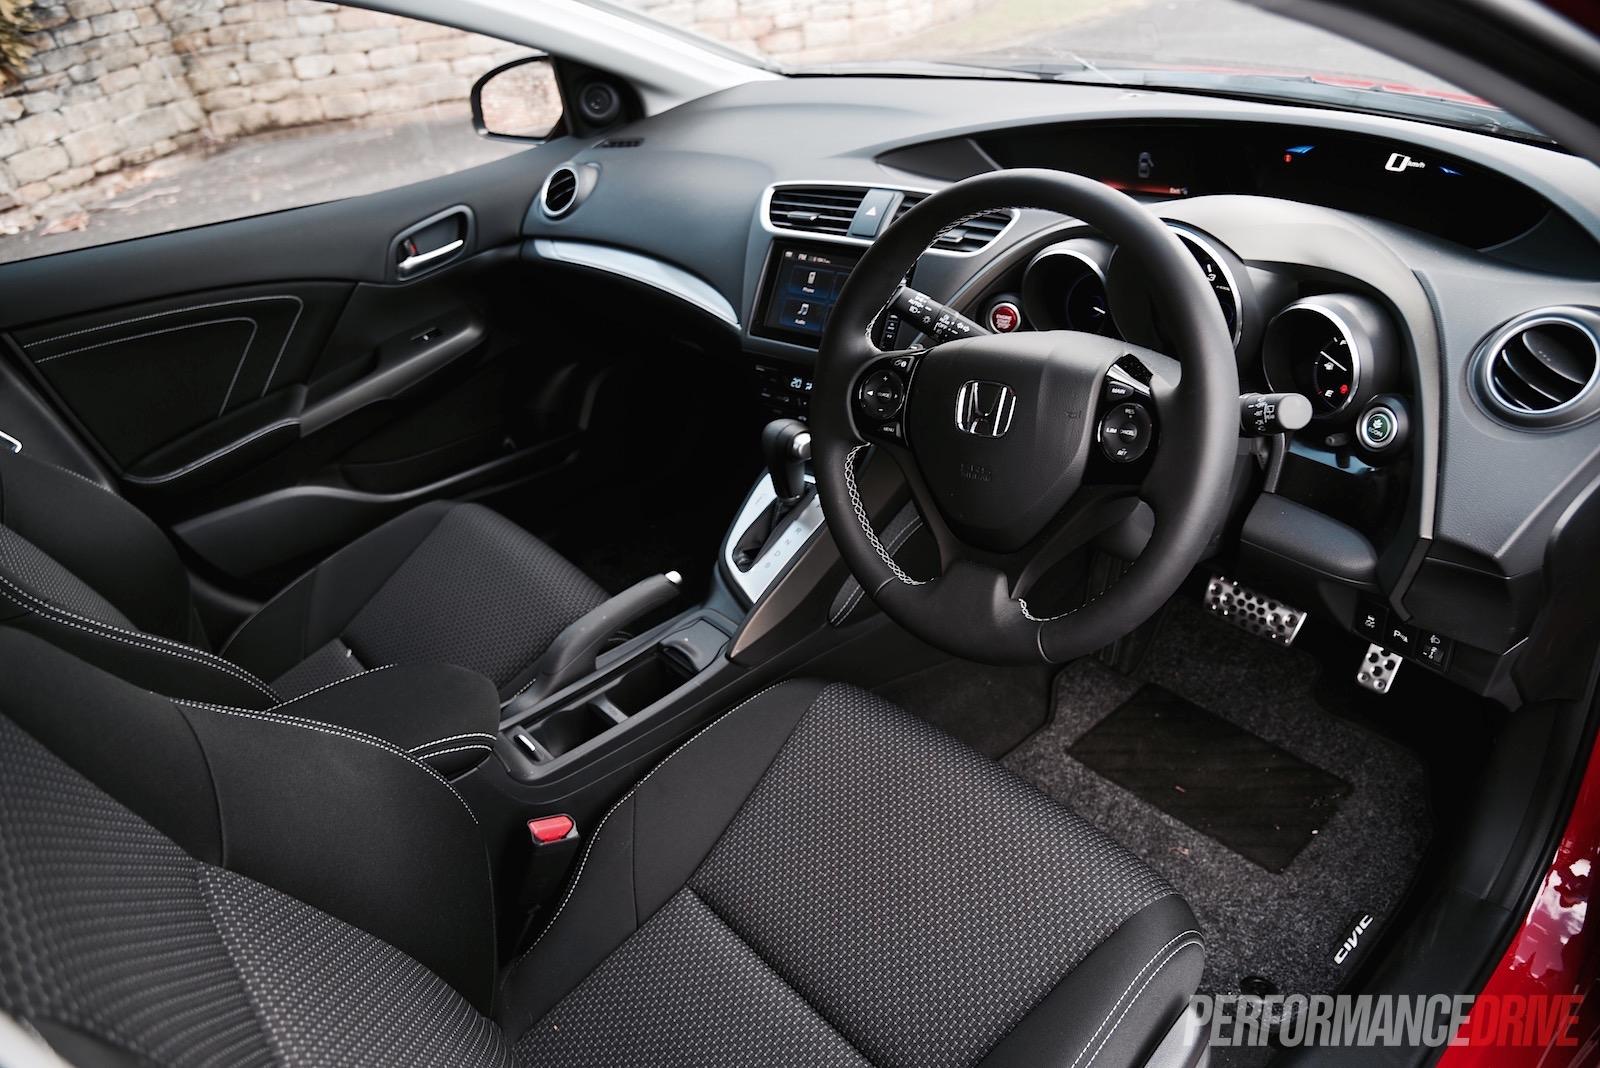 2015 Honda Civic VTi-L hatch review (video) | PerformanceDrive